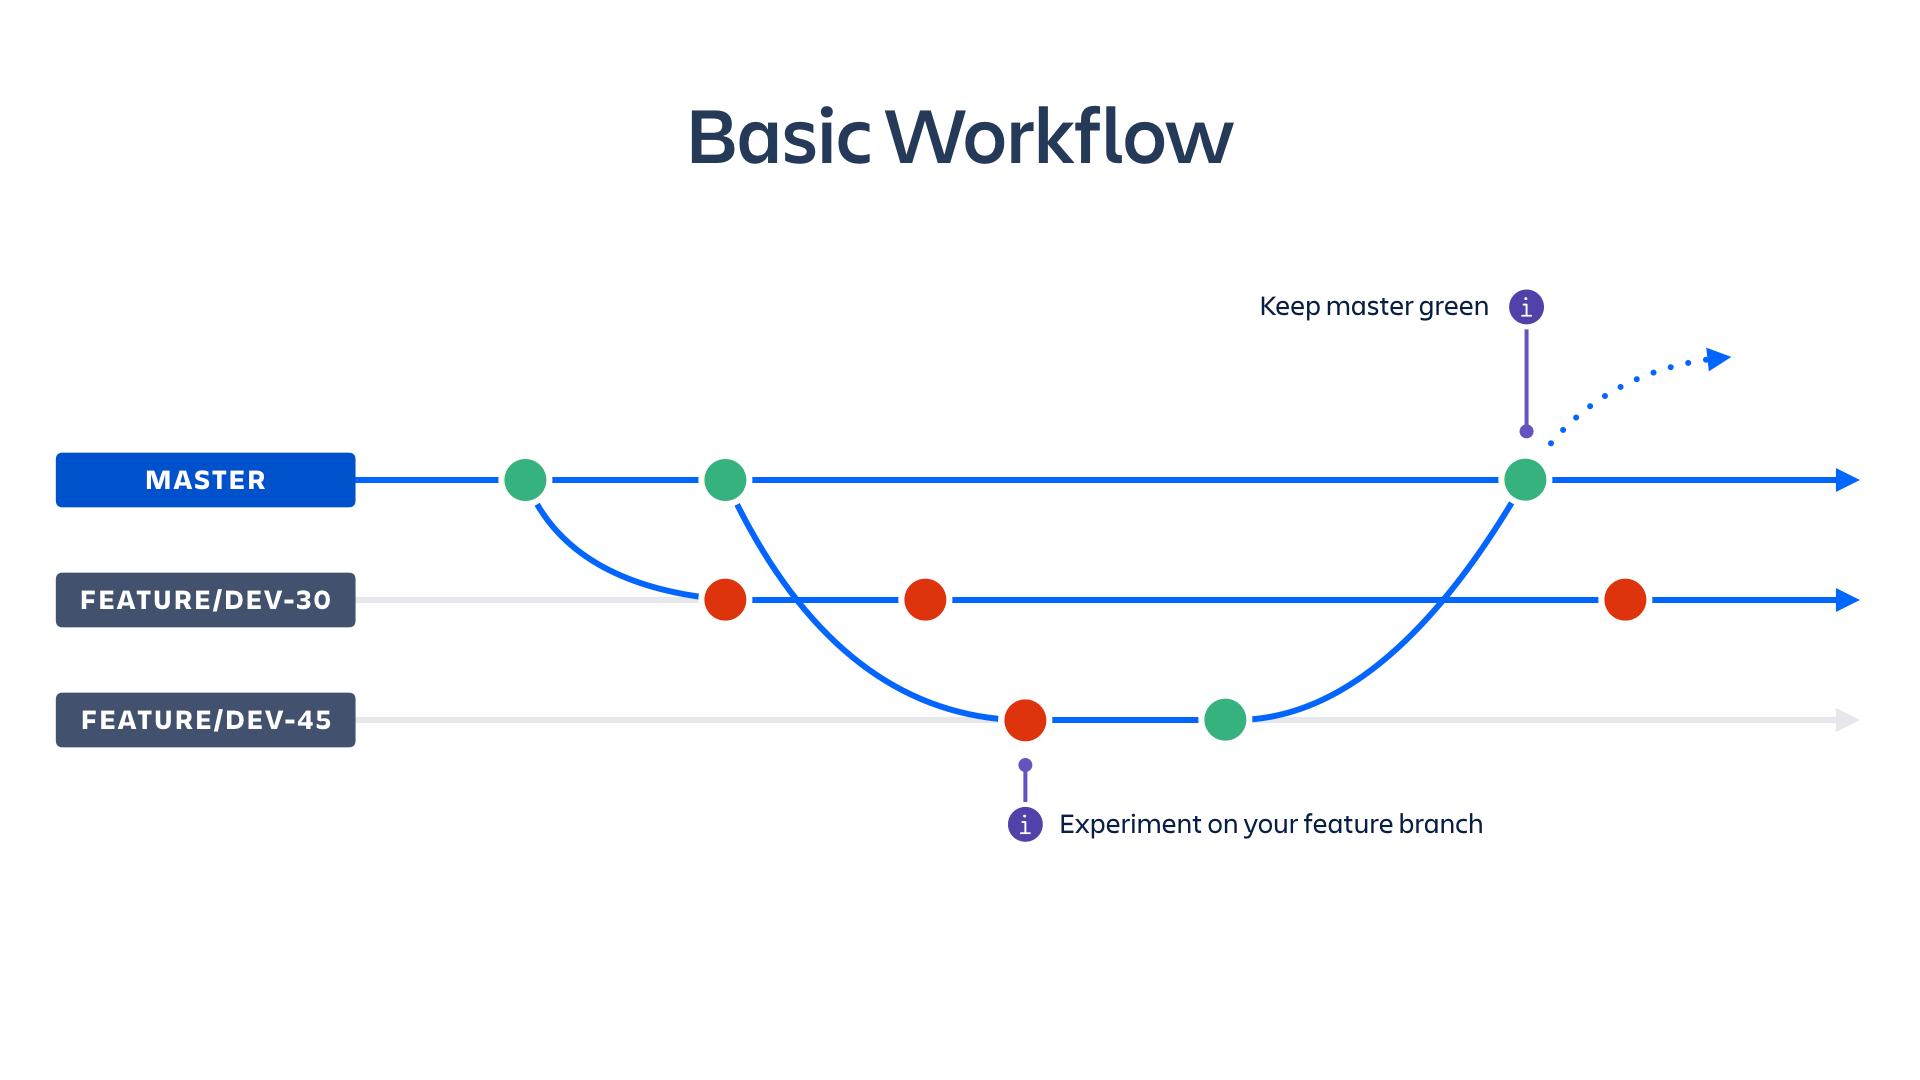 Diagramme des workflows de base| CI/CD Atlassian